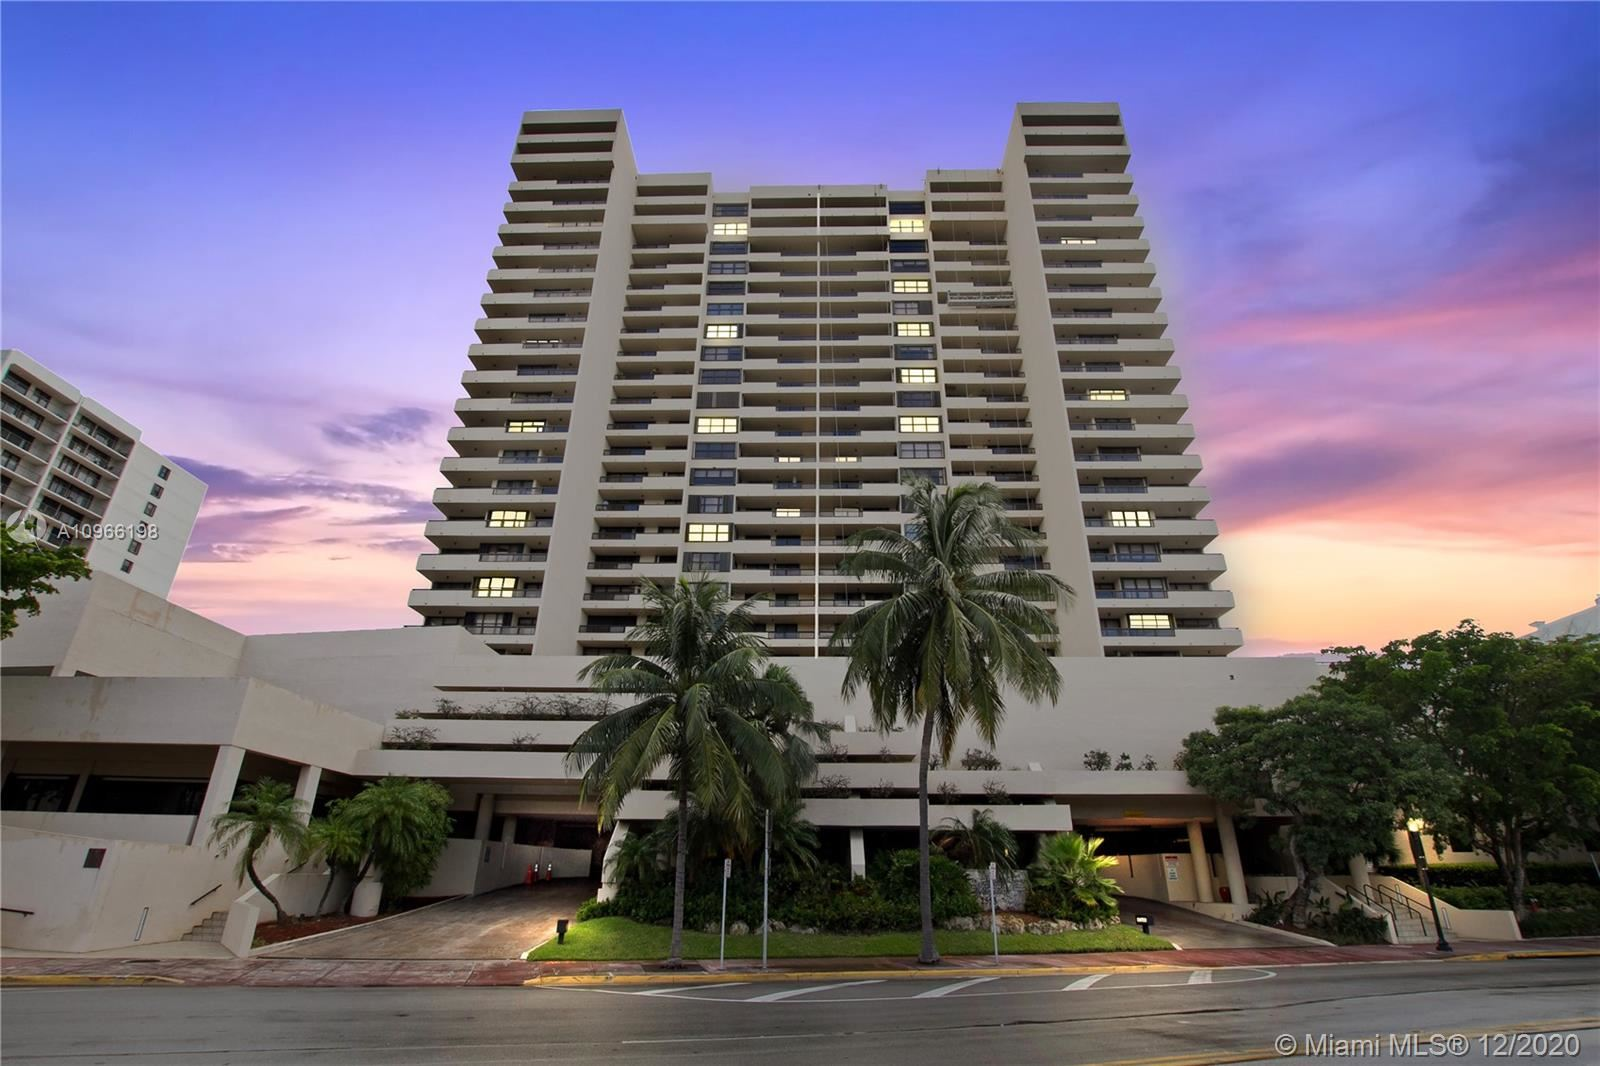 Photo of 2555 Collins Ave #907, Miami Beach, FL 33140 (MLS # A10966198)